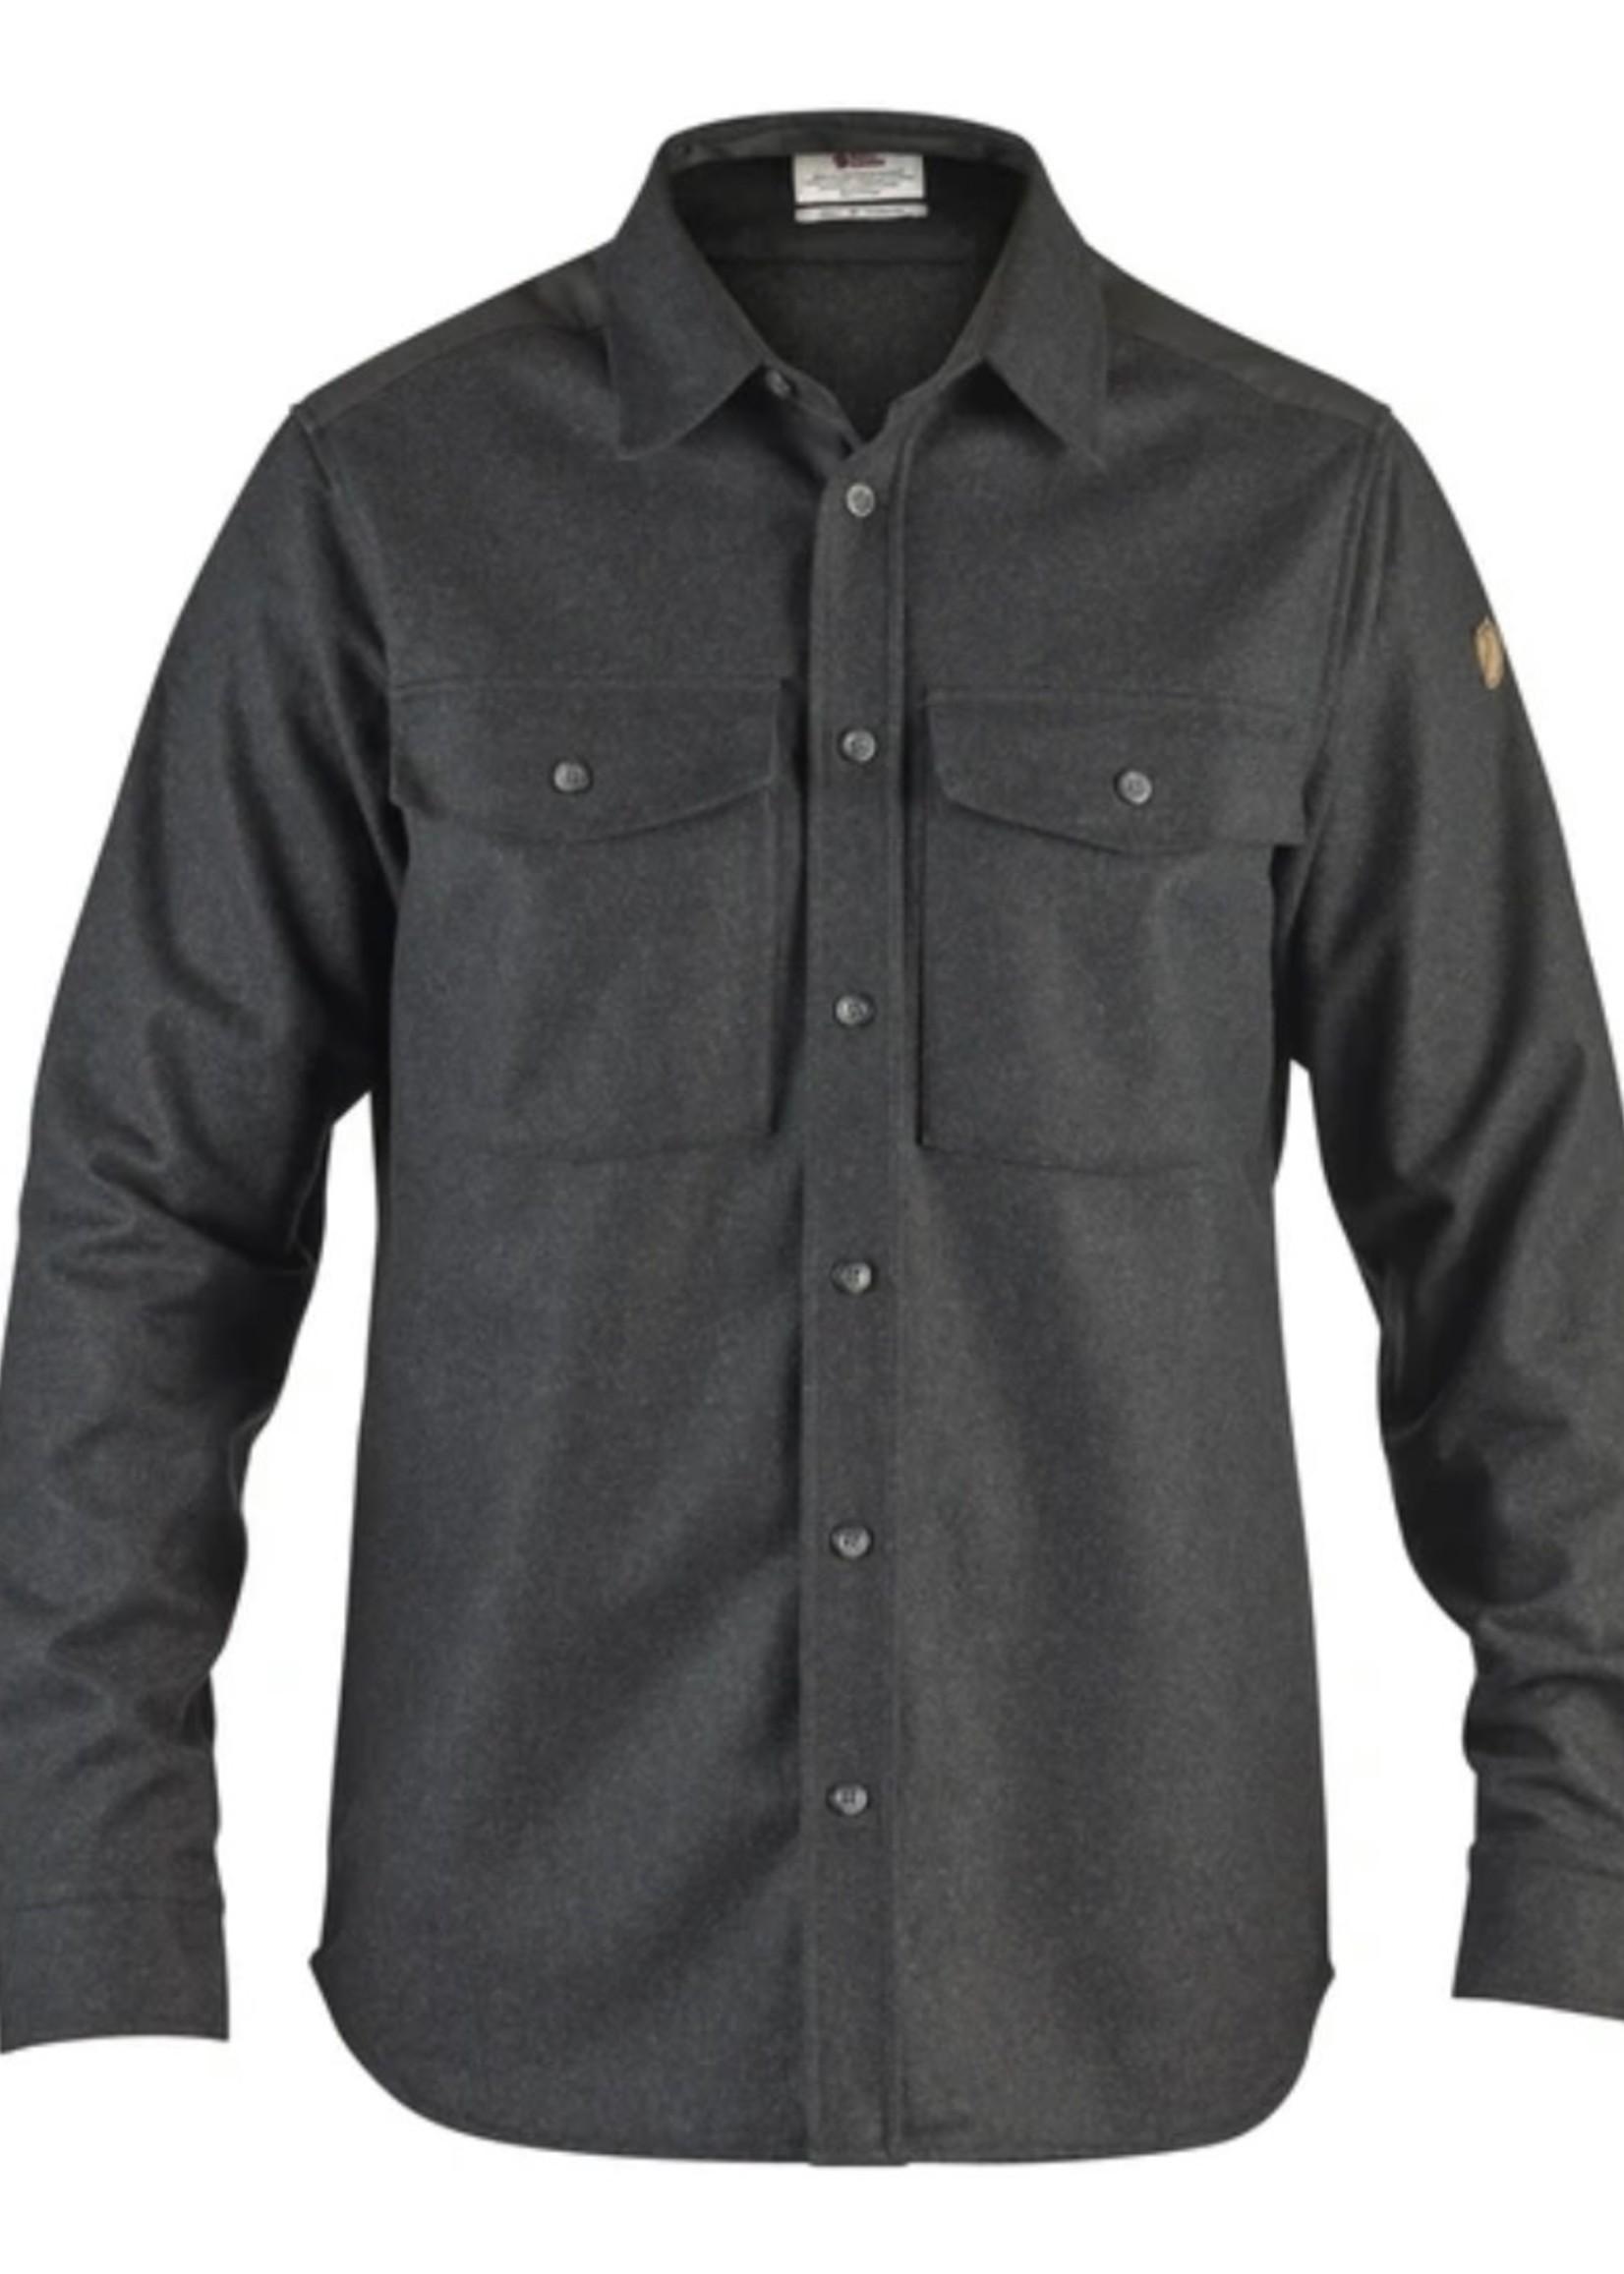 FJALL RAVEN Ovik Re-Wool Shirt LS